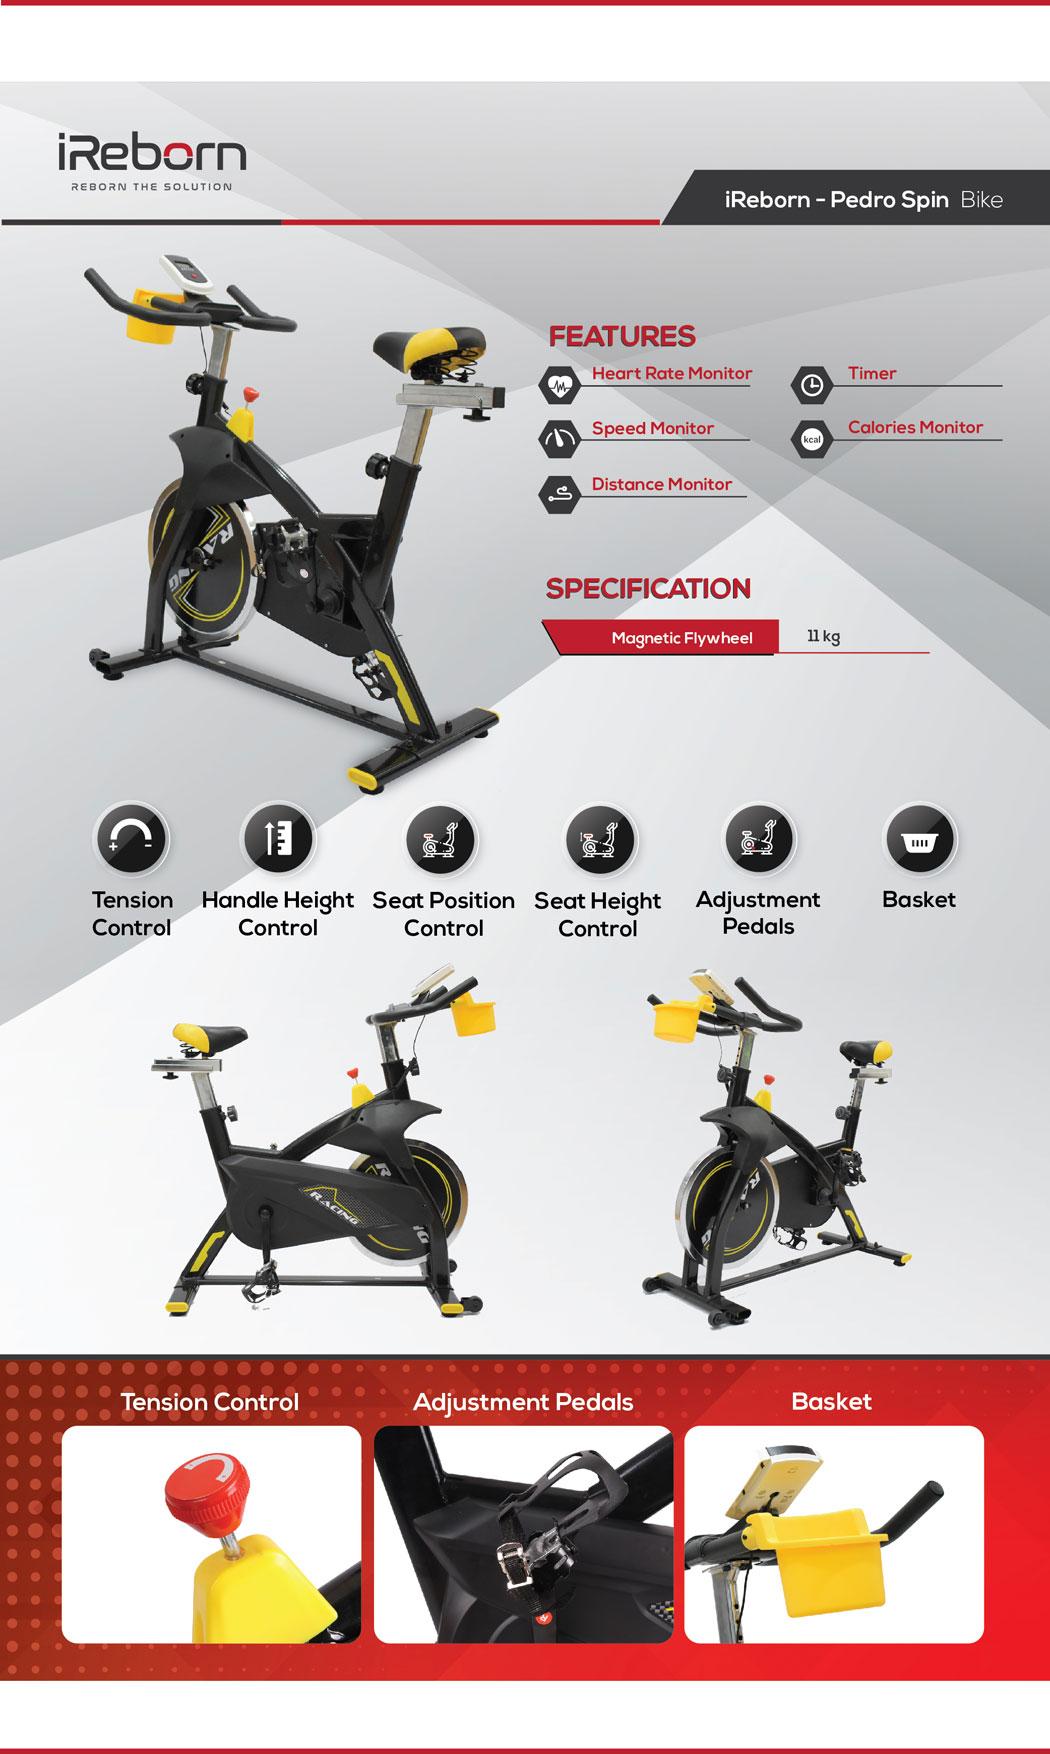 Pedro Spin Bike 26